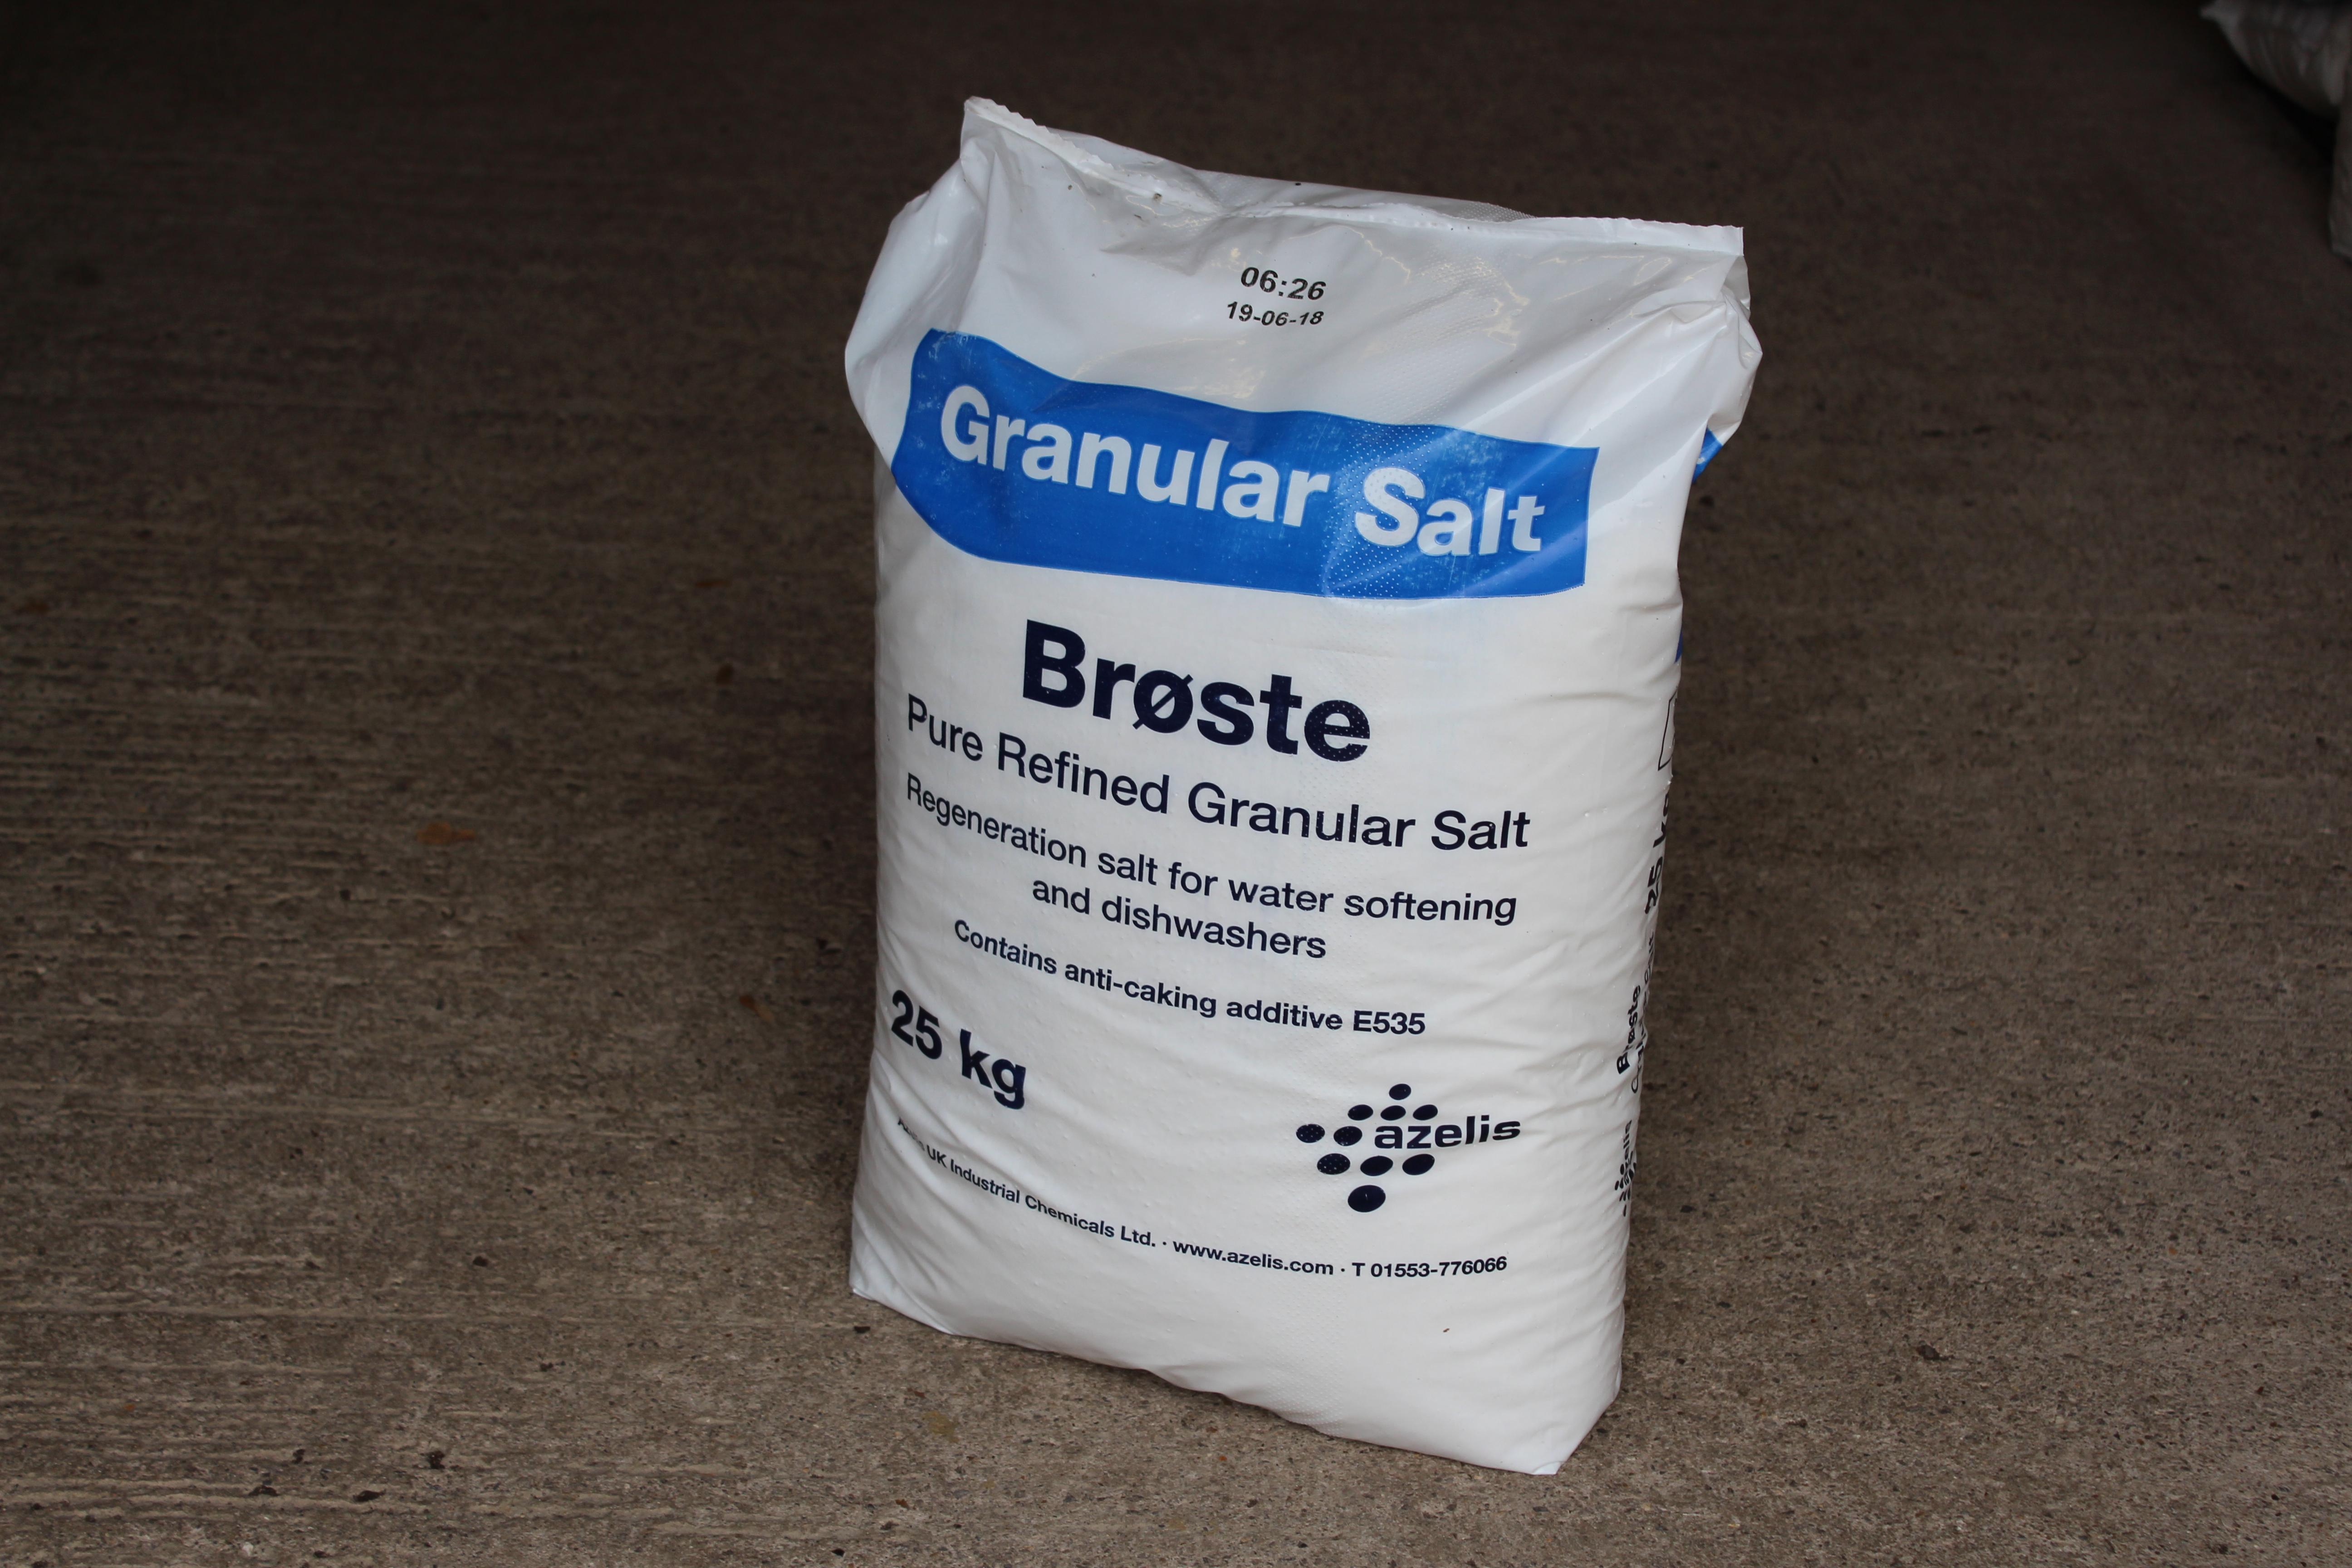 Bag of granular salt for water softeners